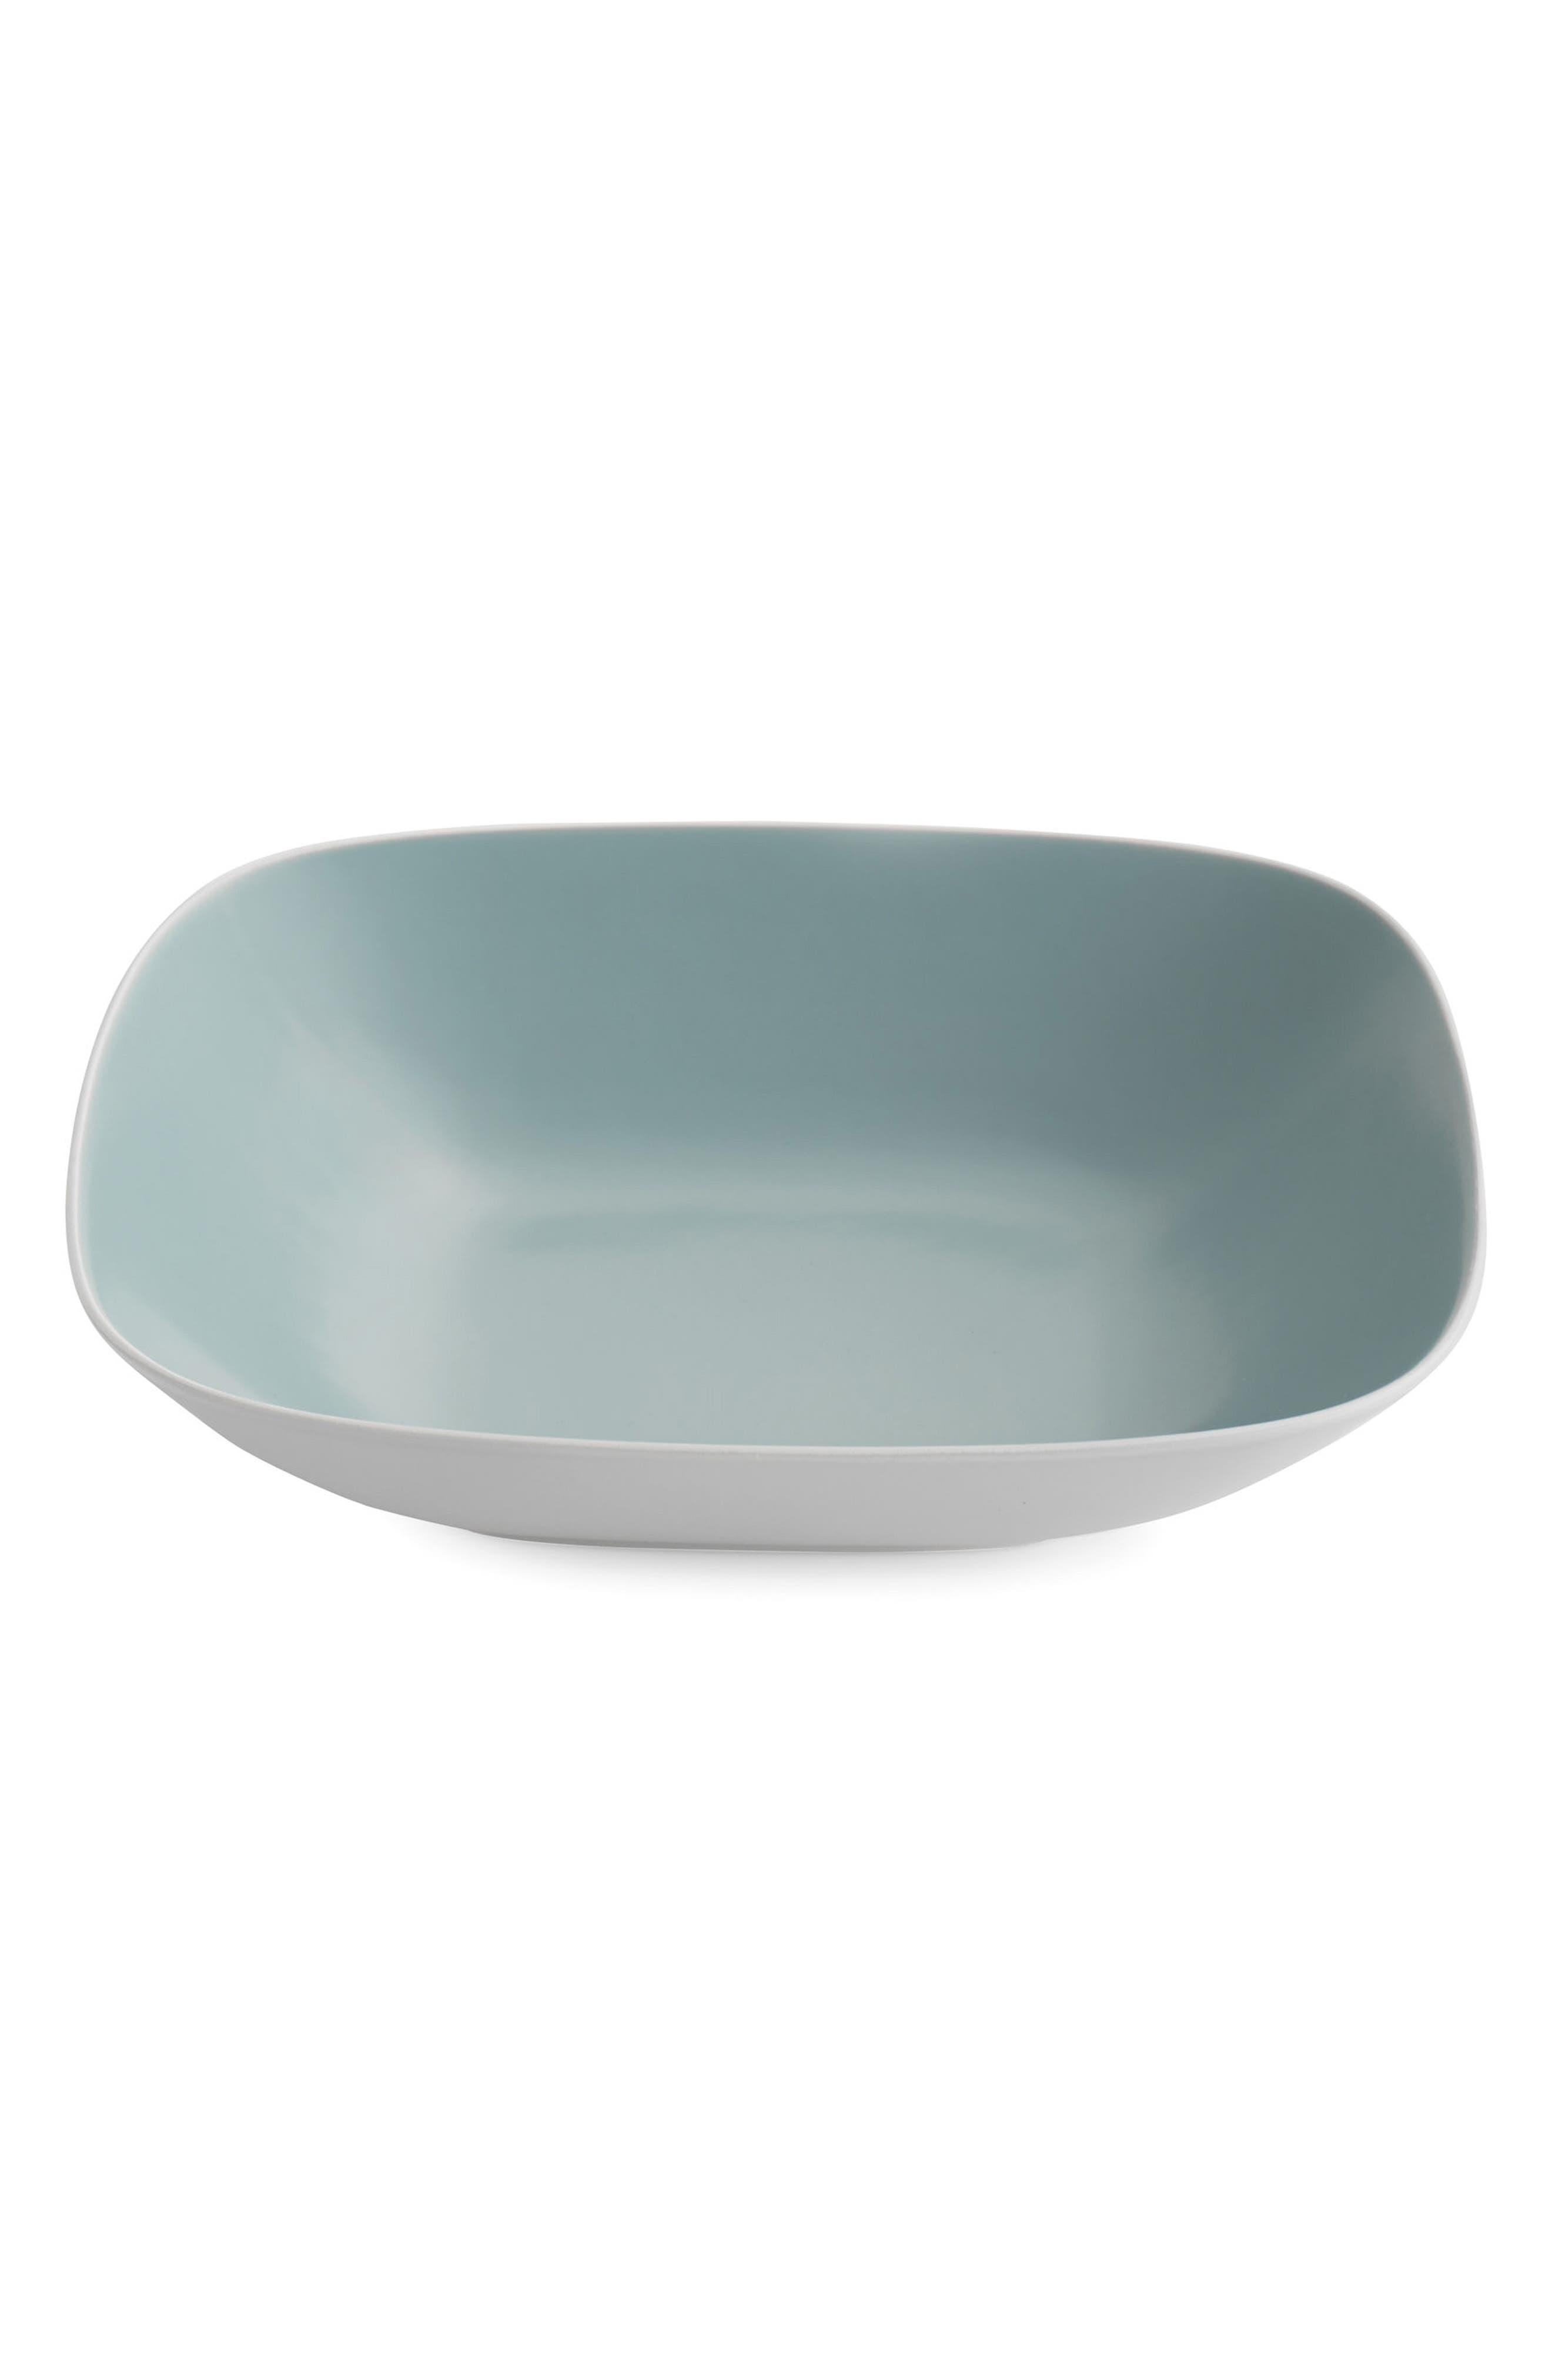 POP Square Serving Bowl,                             Main thumbnail 1, color,                             Ocean